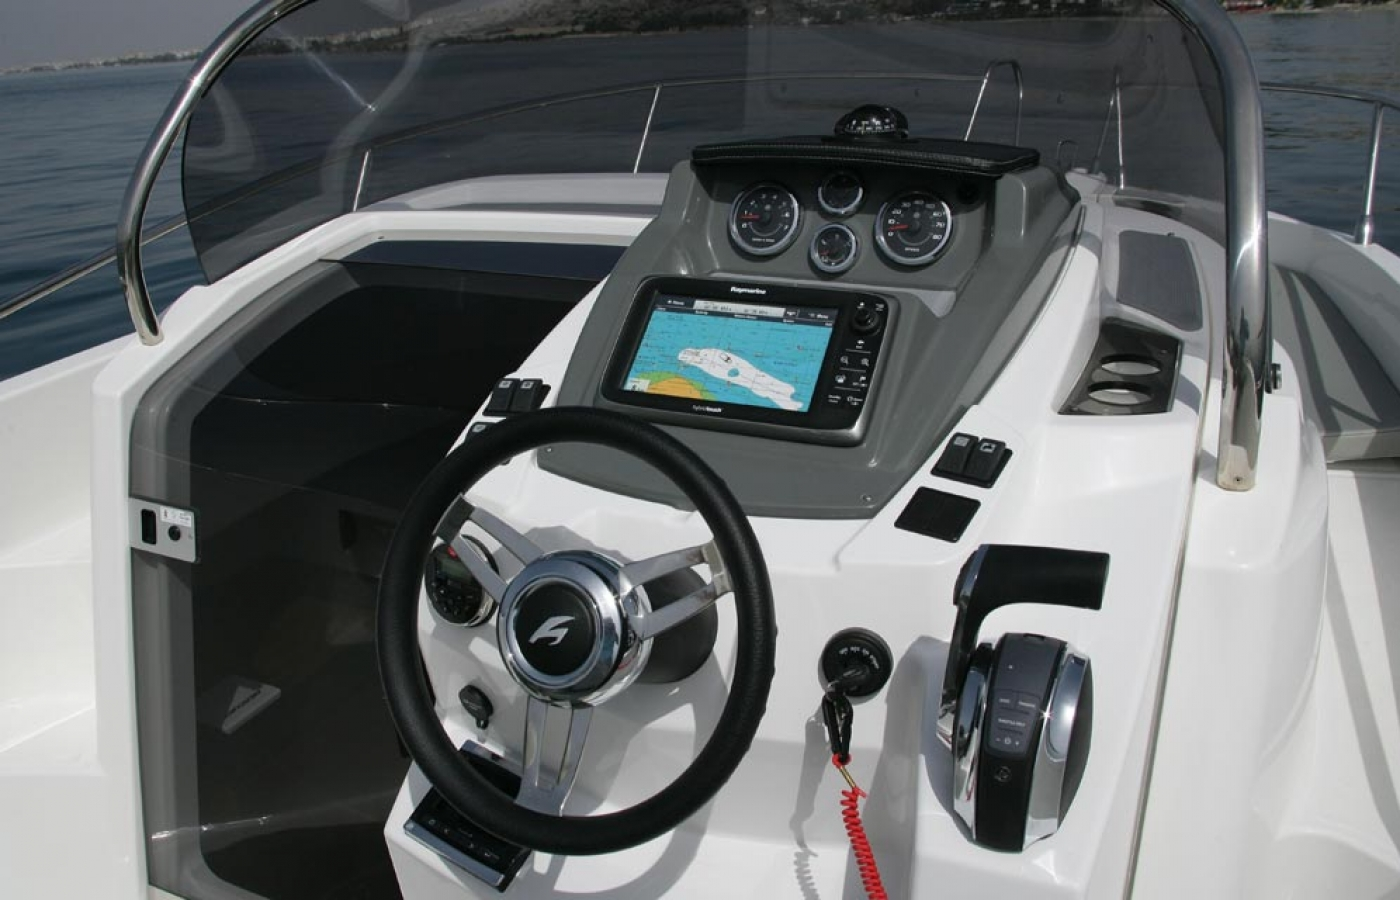 The cockpit of the Karnic SL702 - Meliti